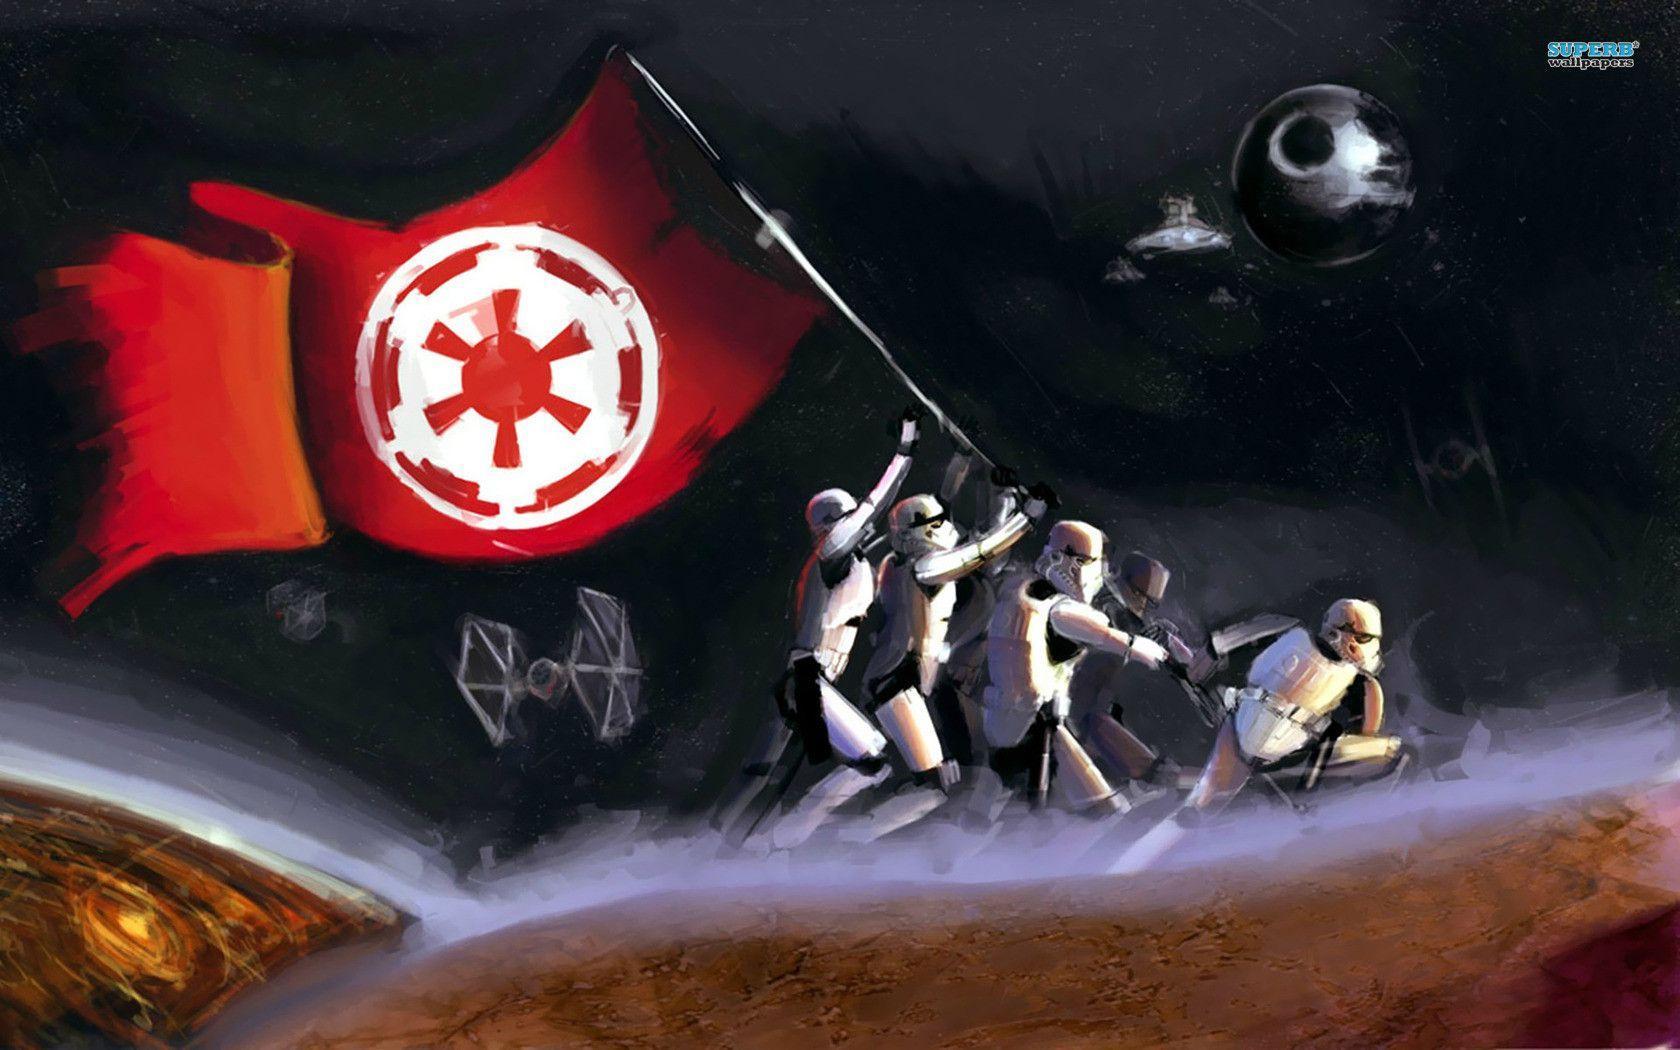 epic star wars trooper wallpaper - photo #18